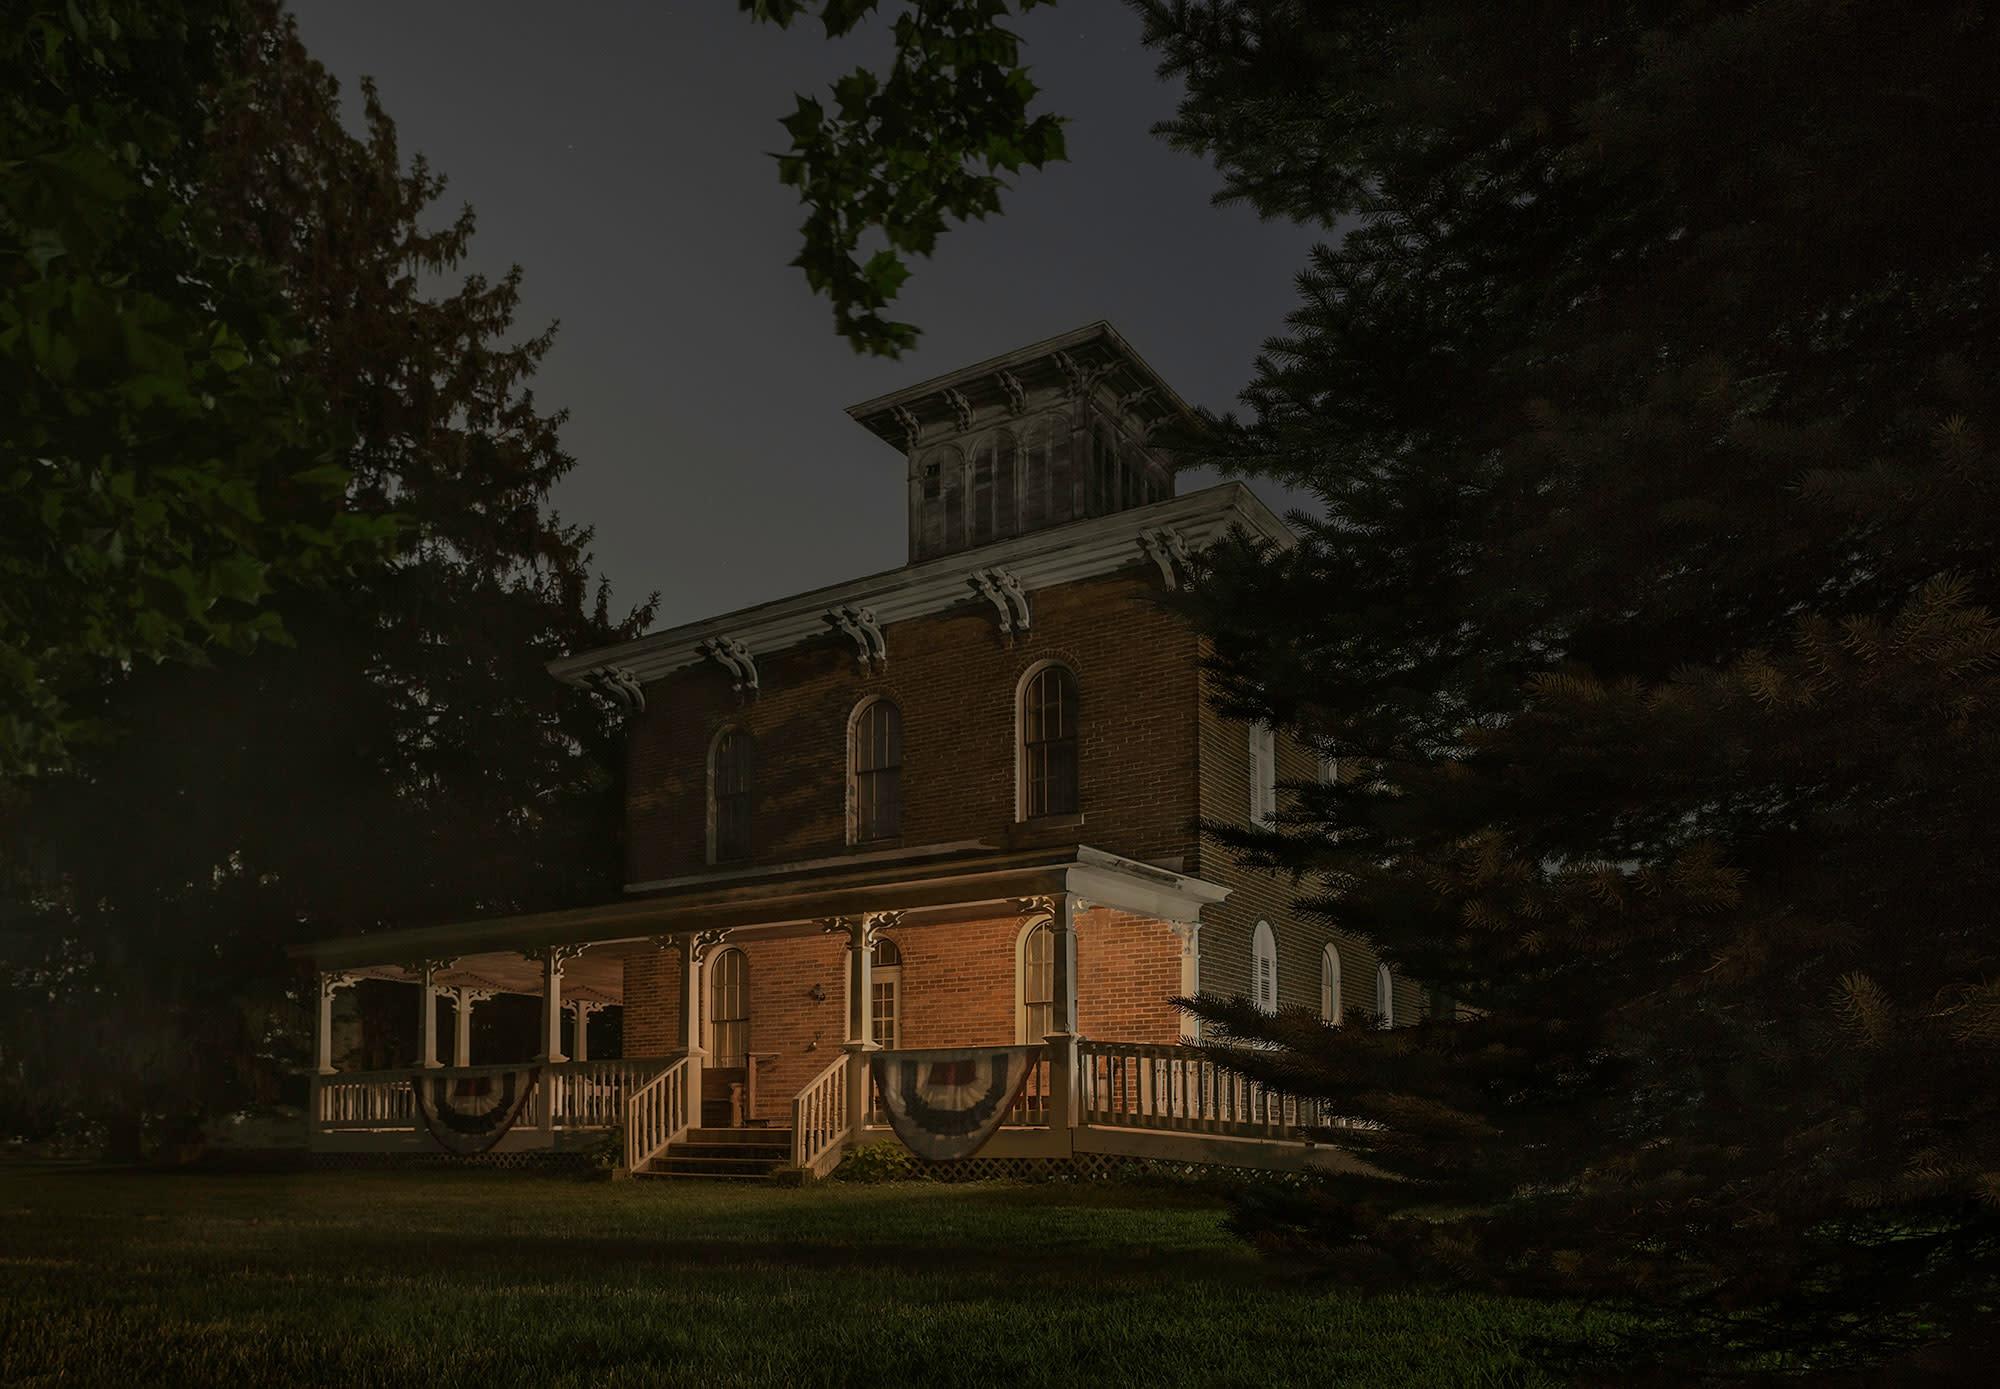 <p>Erastus Farnham House, south of Fremont, Indiana. (Photograph by Jeanine Michna-Bales) </p>